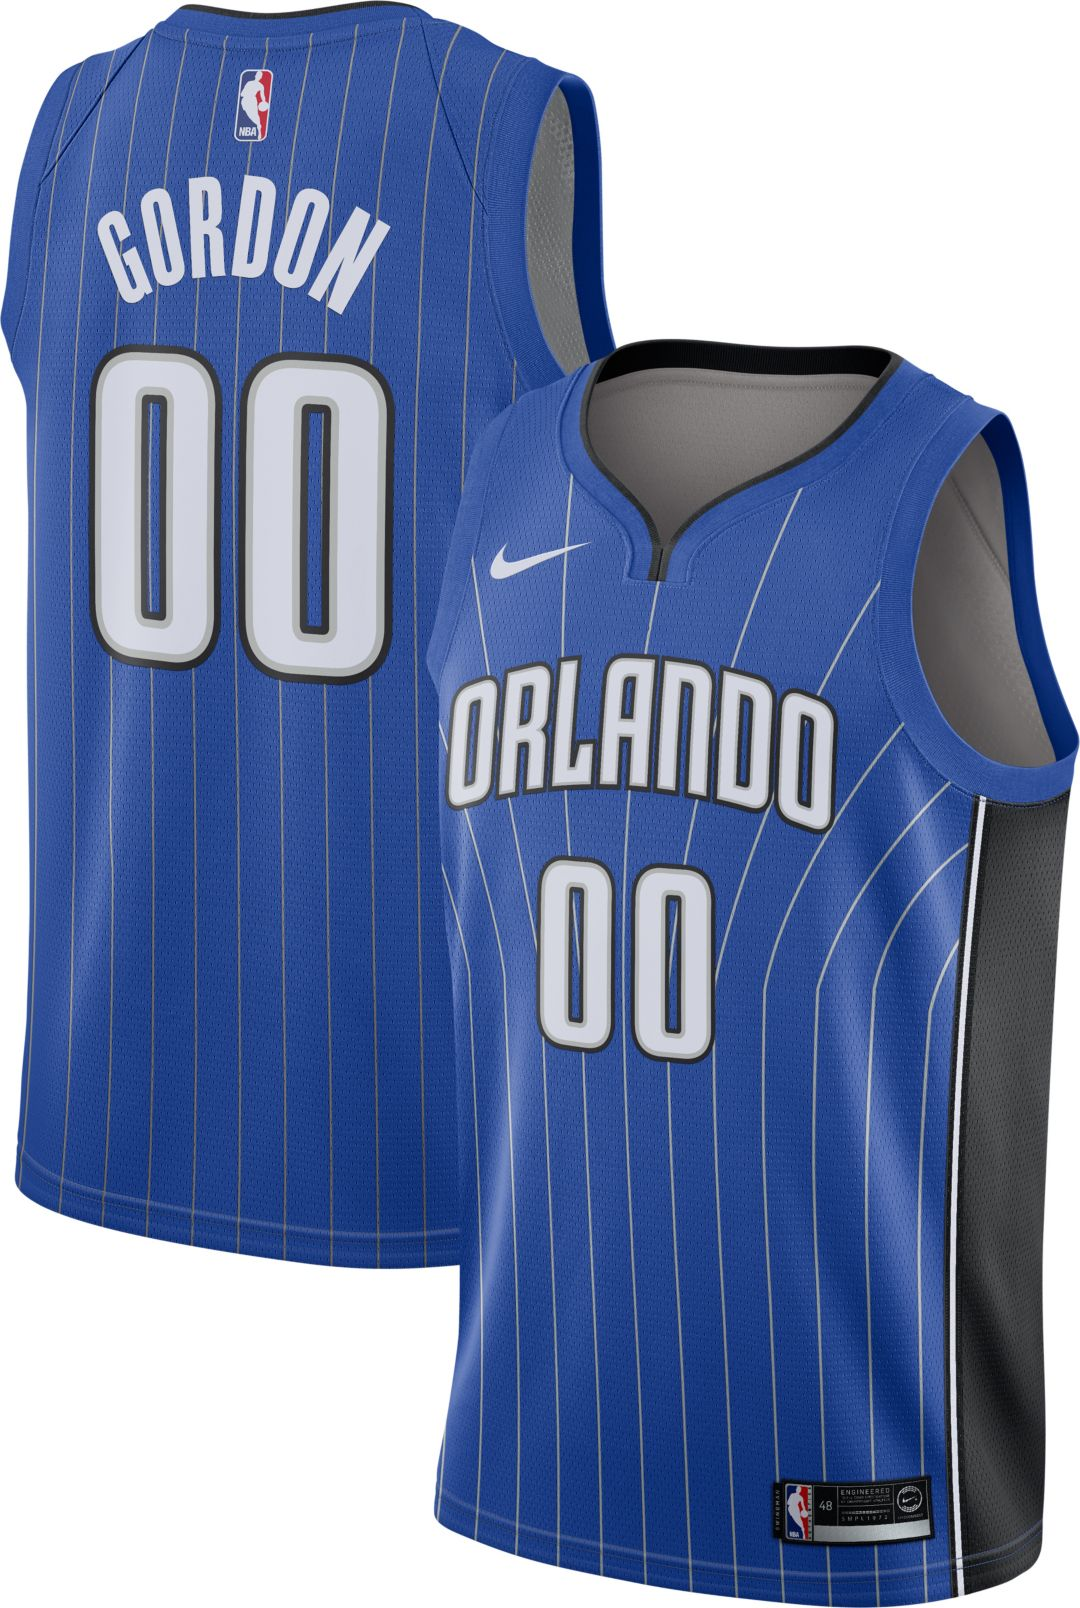 lowest price 5658a 1c786 Nike Men's Orlando Magic Aaron Gordon #00 Royal Dri-FIT Swingman Jersey